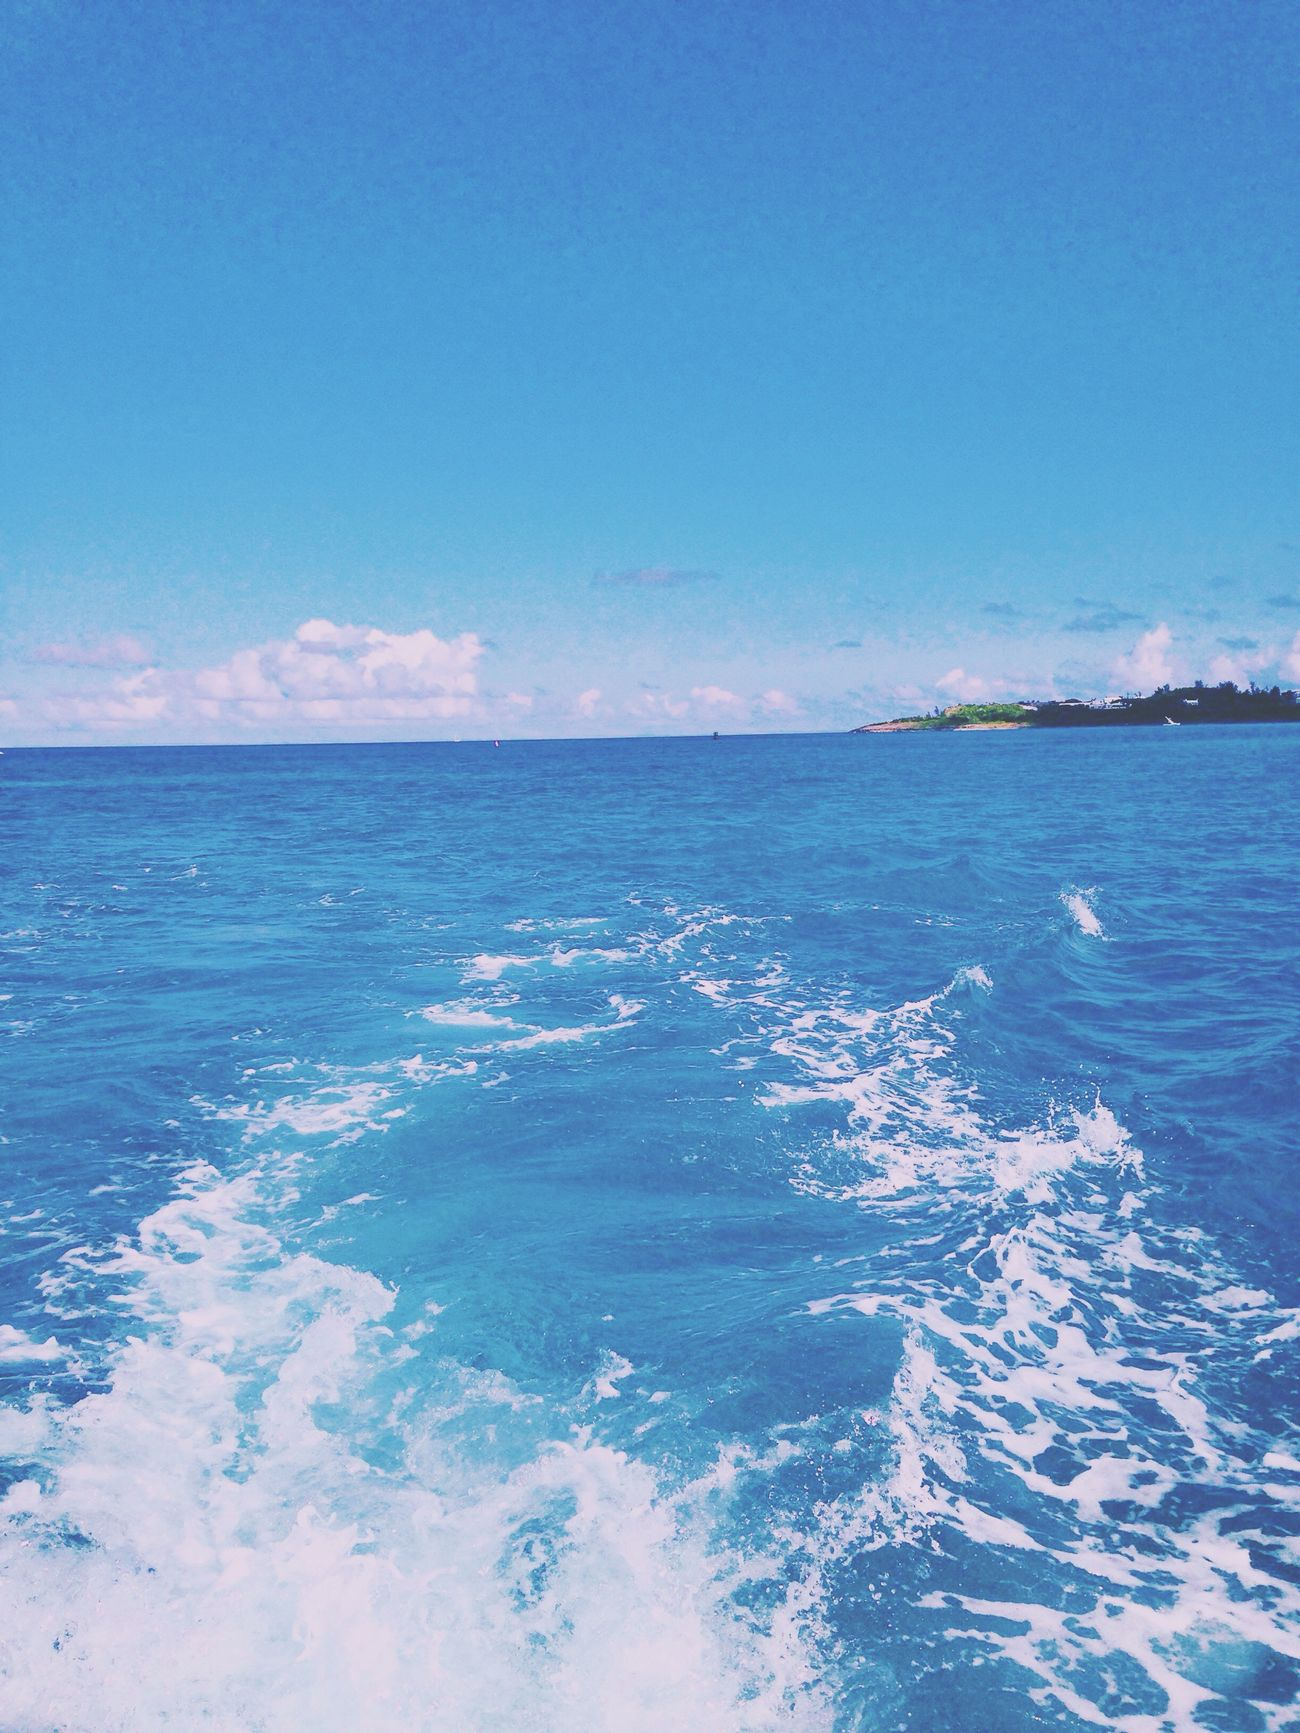 cruisin 🌊🚤 Onaboat Boats Ocean Enjoying Life Water Blue